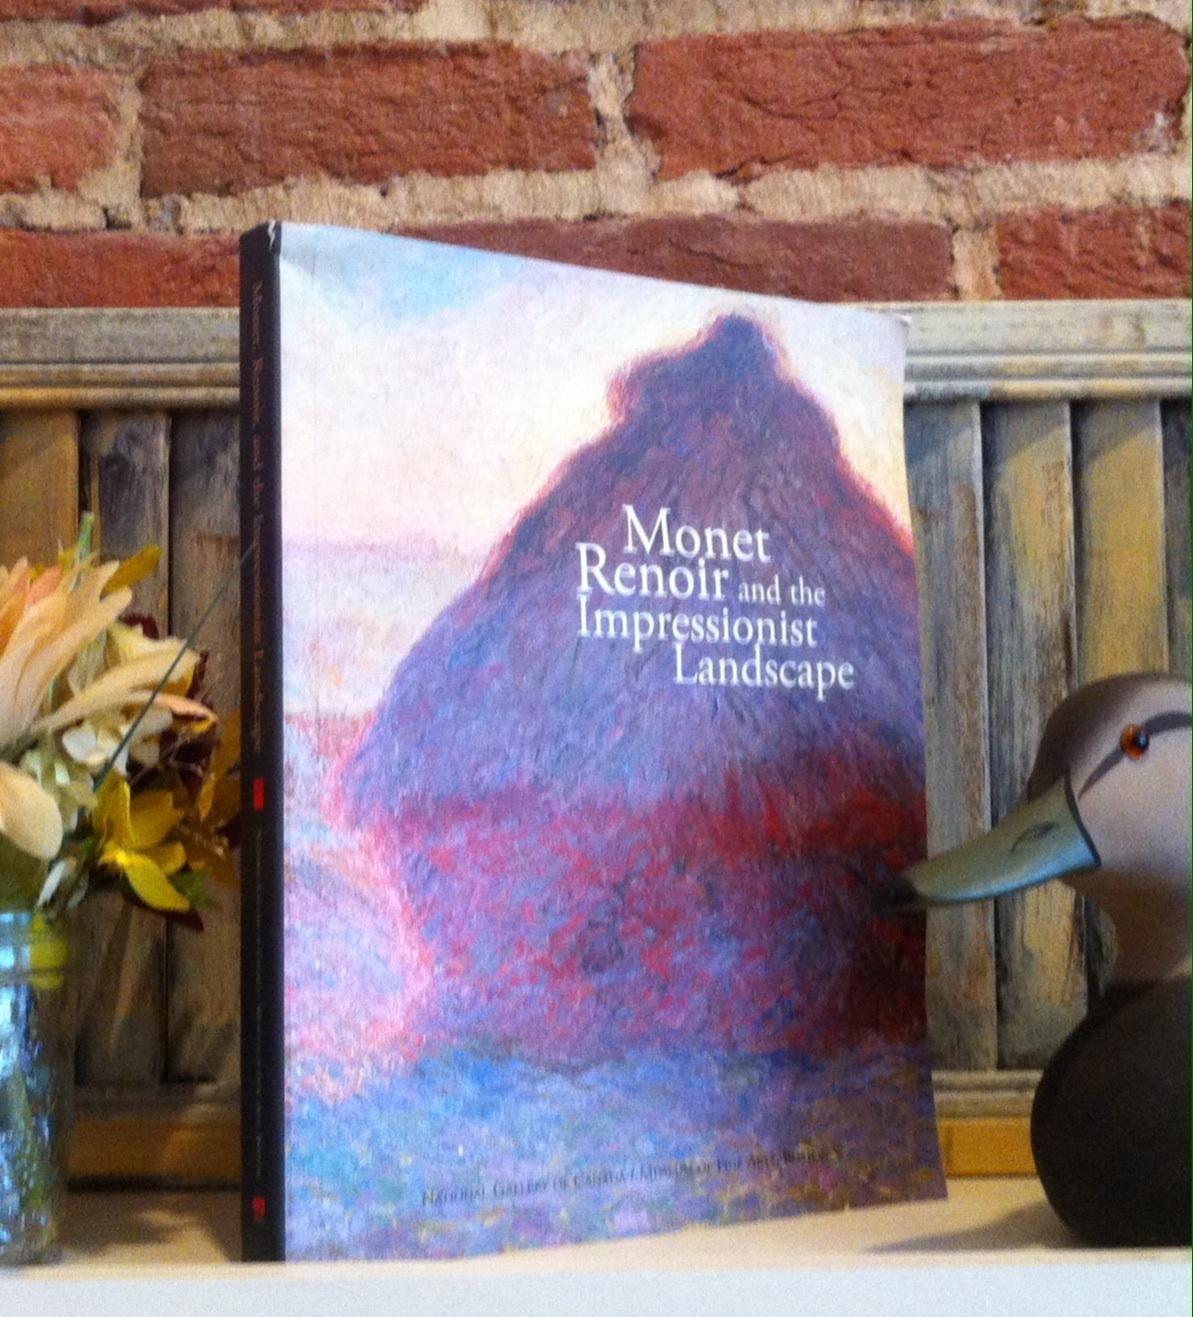 Monet, Renoir, and the impressionist landscape pdf